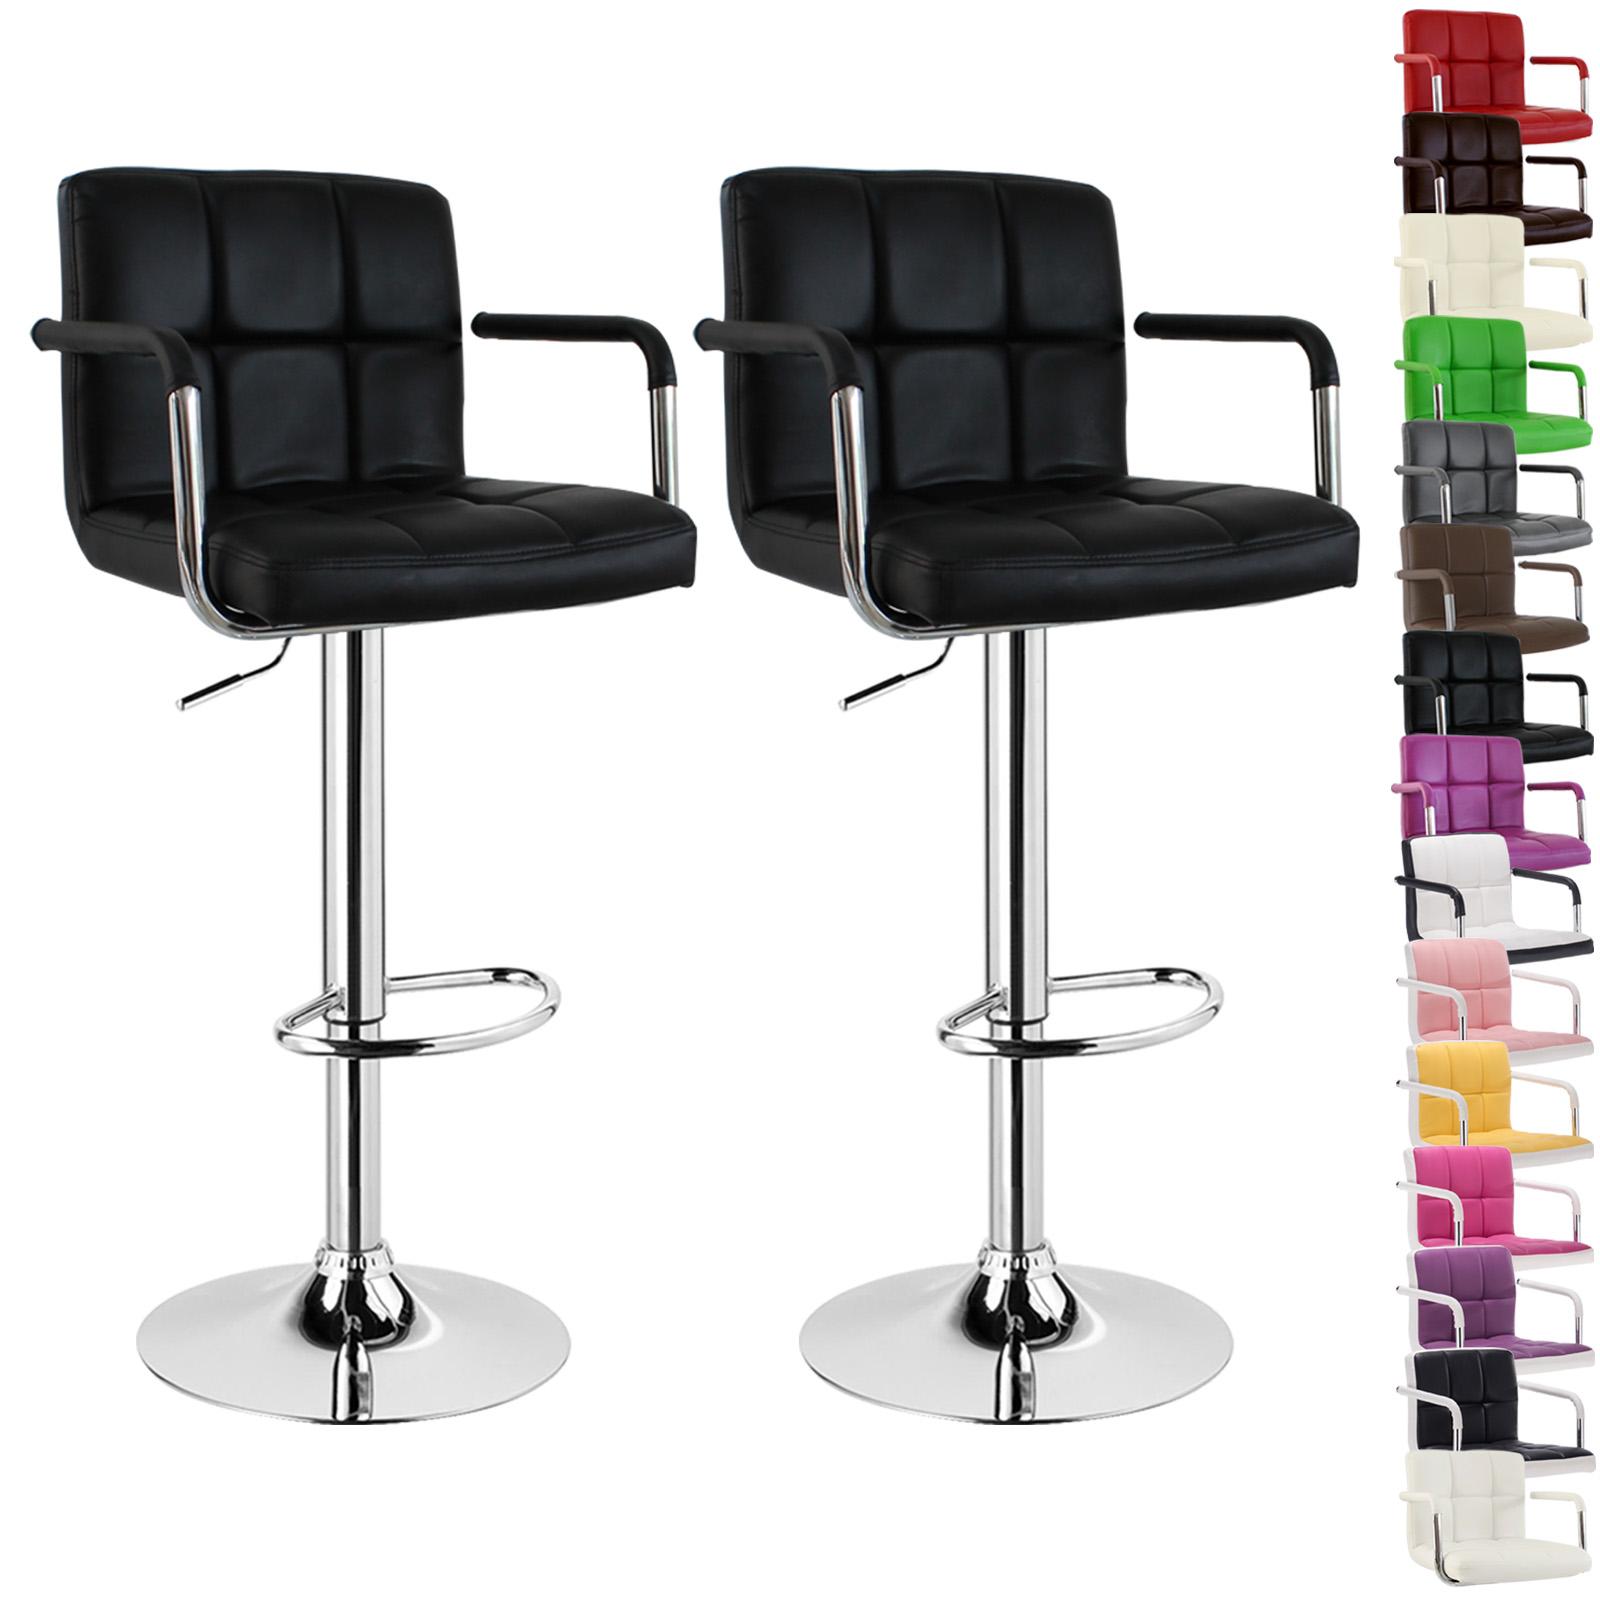 barhocker barstuhl barsessel kunstleder tresenhocker bar hocker schwarz 331 ebay. Black Bedroom Furniture Sets. Home Design Ideas